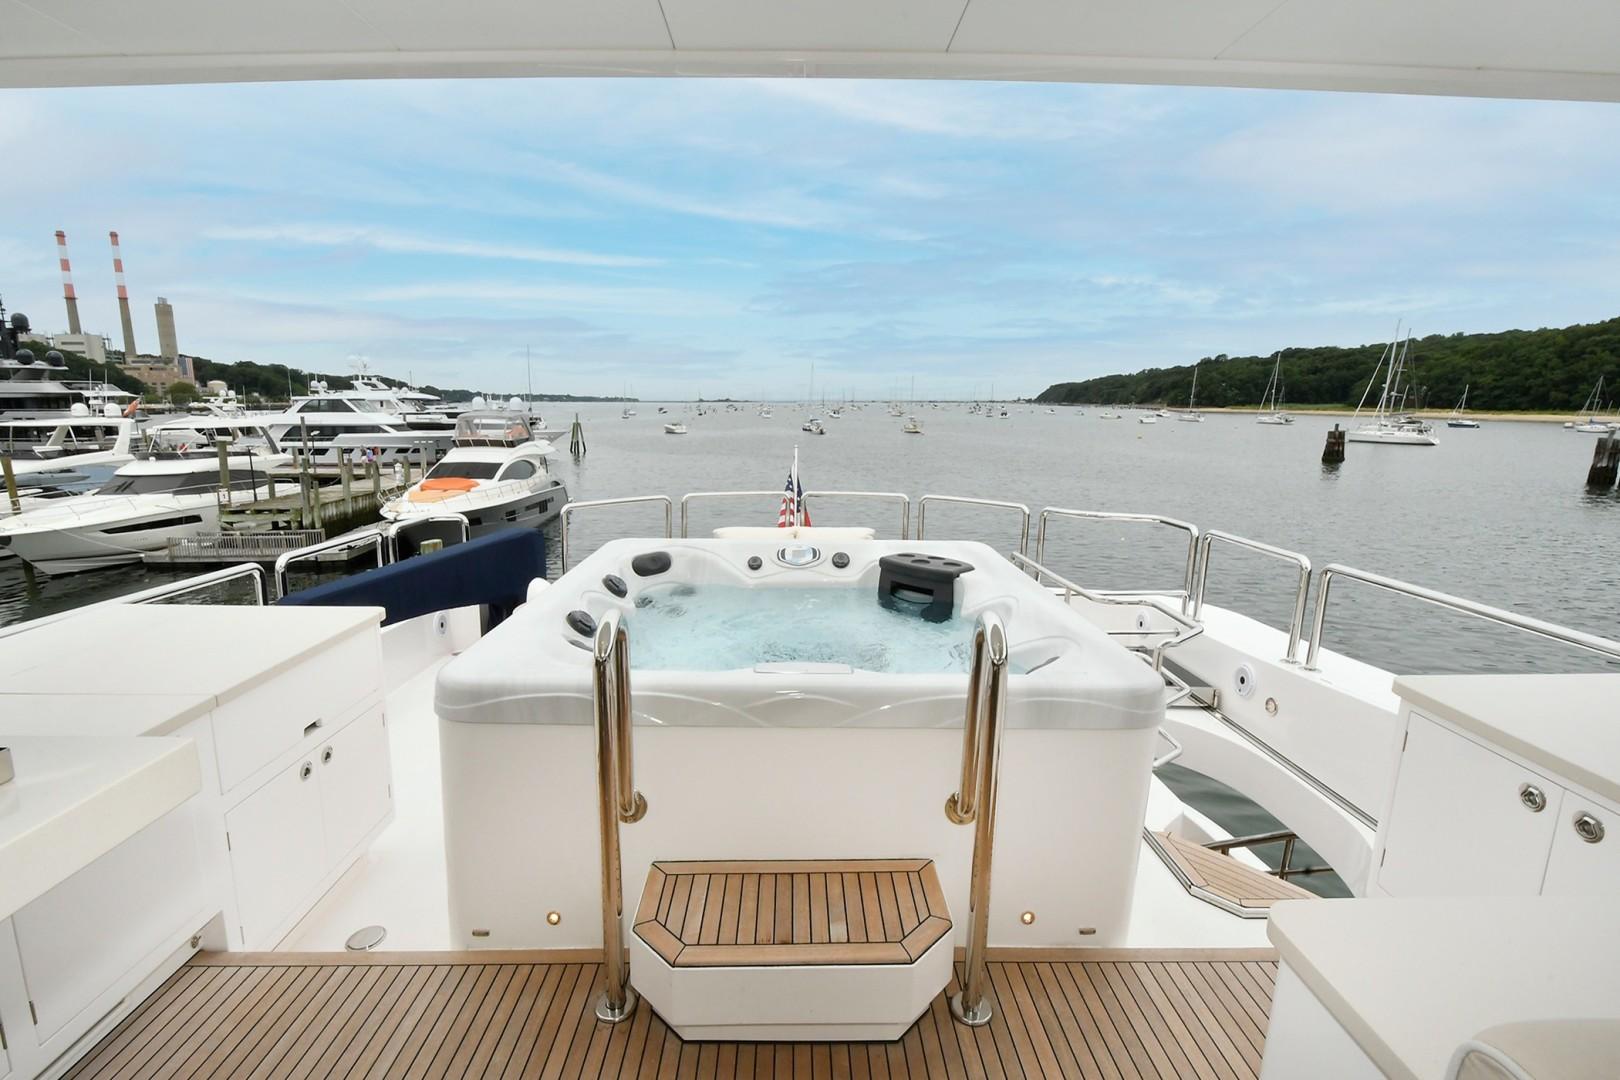 Horizon 110 - Neverland - Flybridge Hot tub